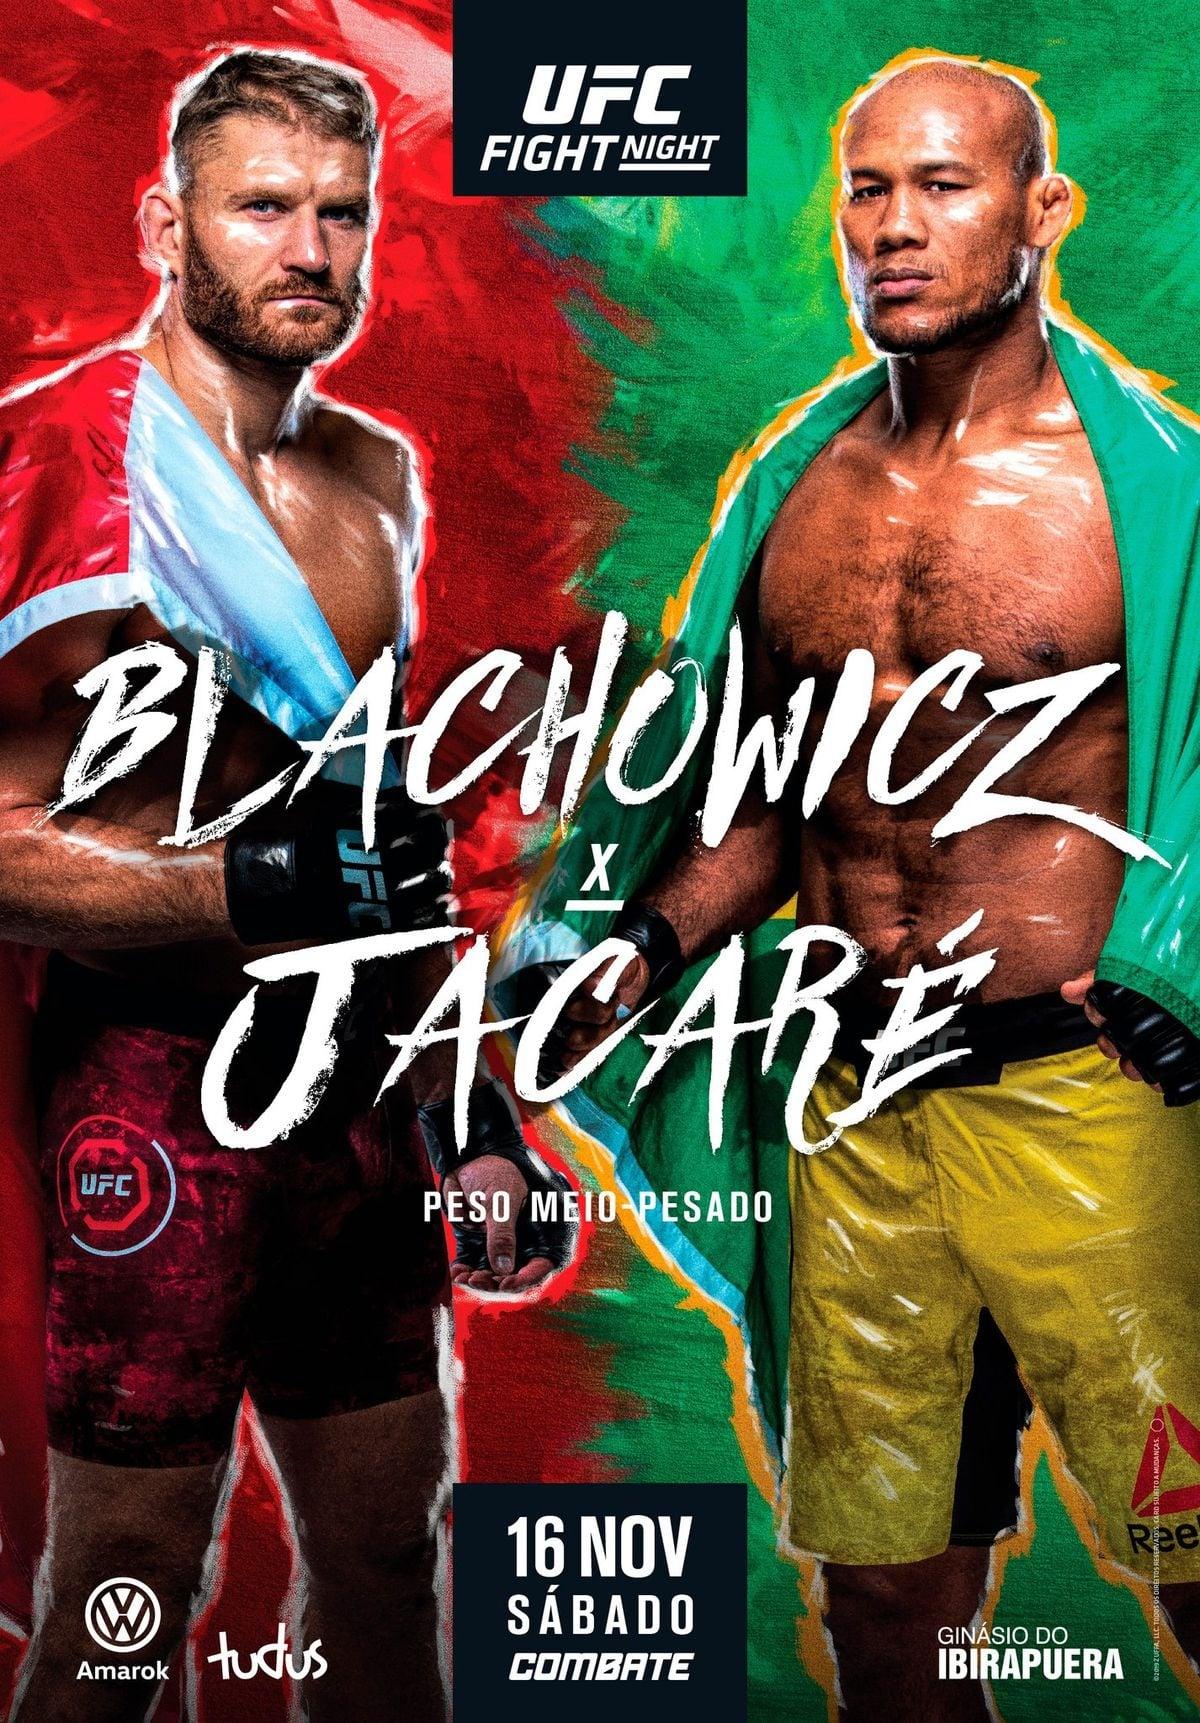 UFC Fight Night 164 - Blachowicz vs. Jacare